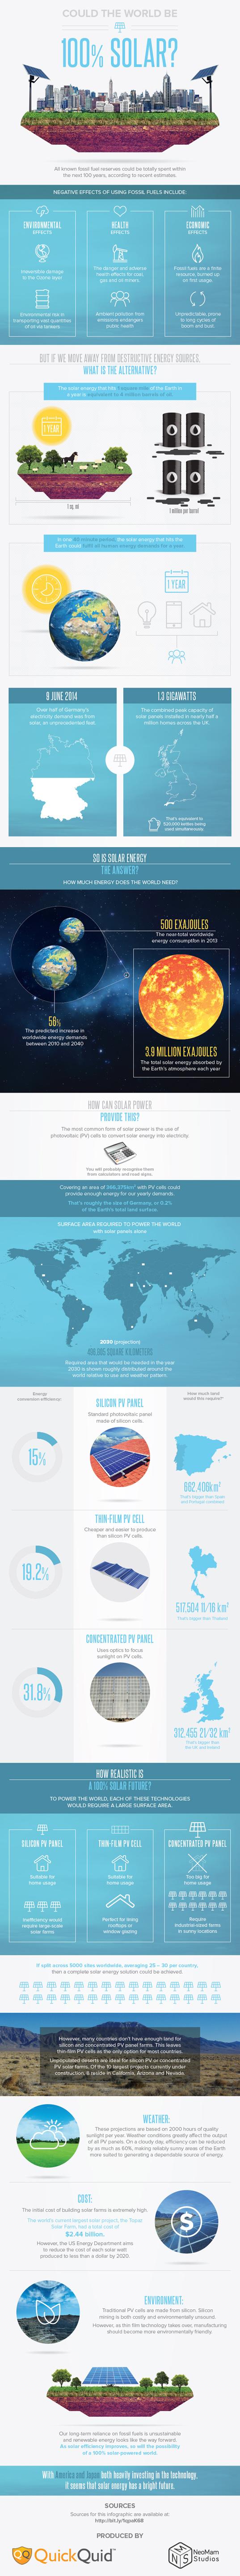 Courtesy http://assets.inhabitat.com/wp-content/blogs.dir/1/files/2014/11/Could-the-World-be-100-Solar-V2.jpg